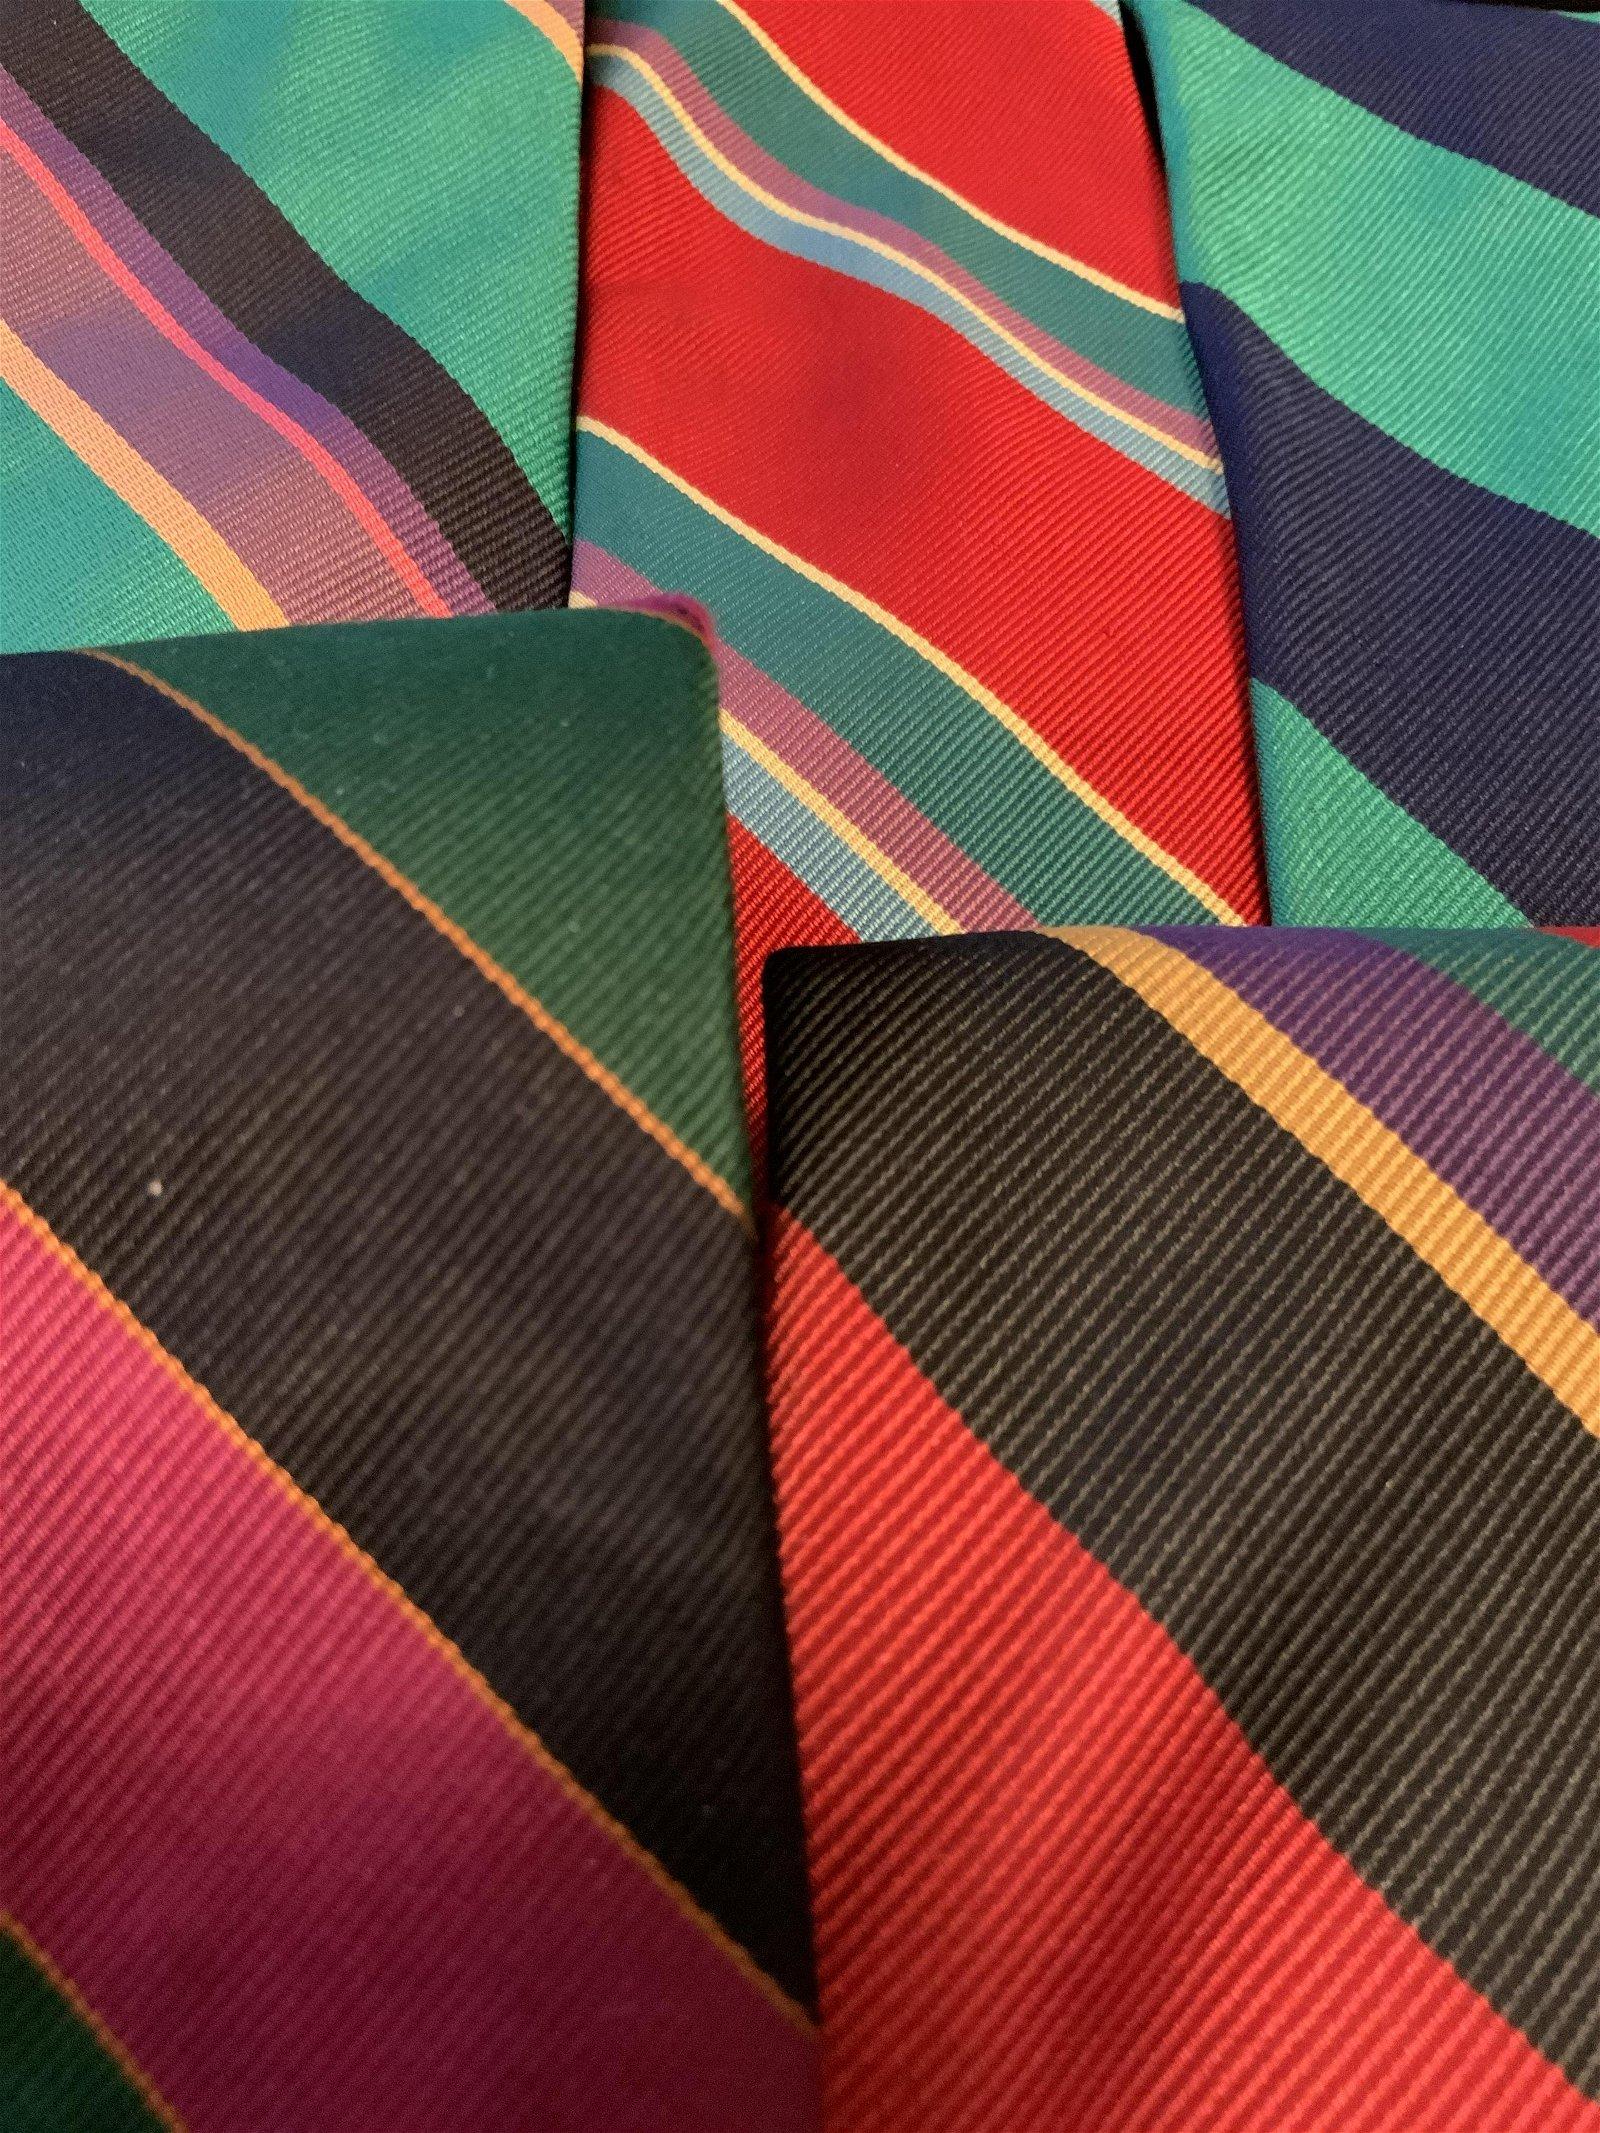 Group Lot 5 Men's Fashion Striped Ties